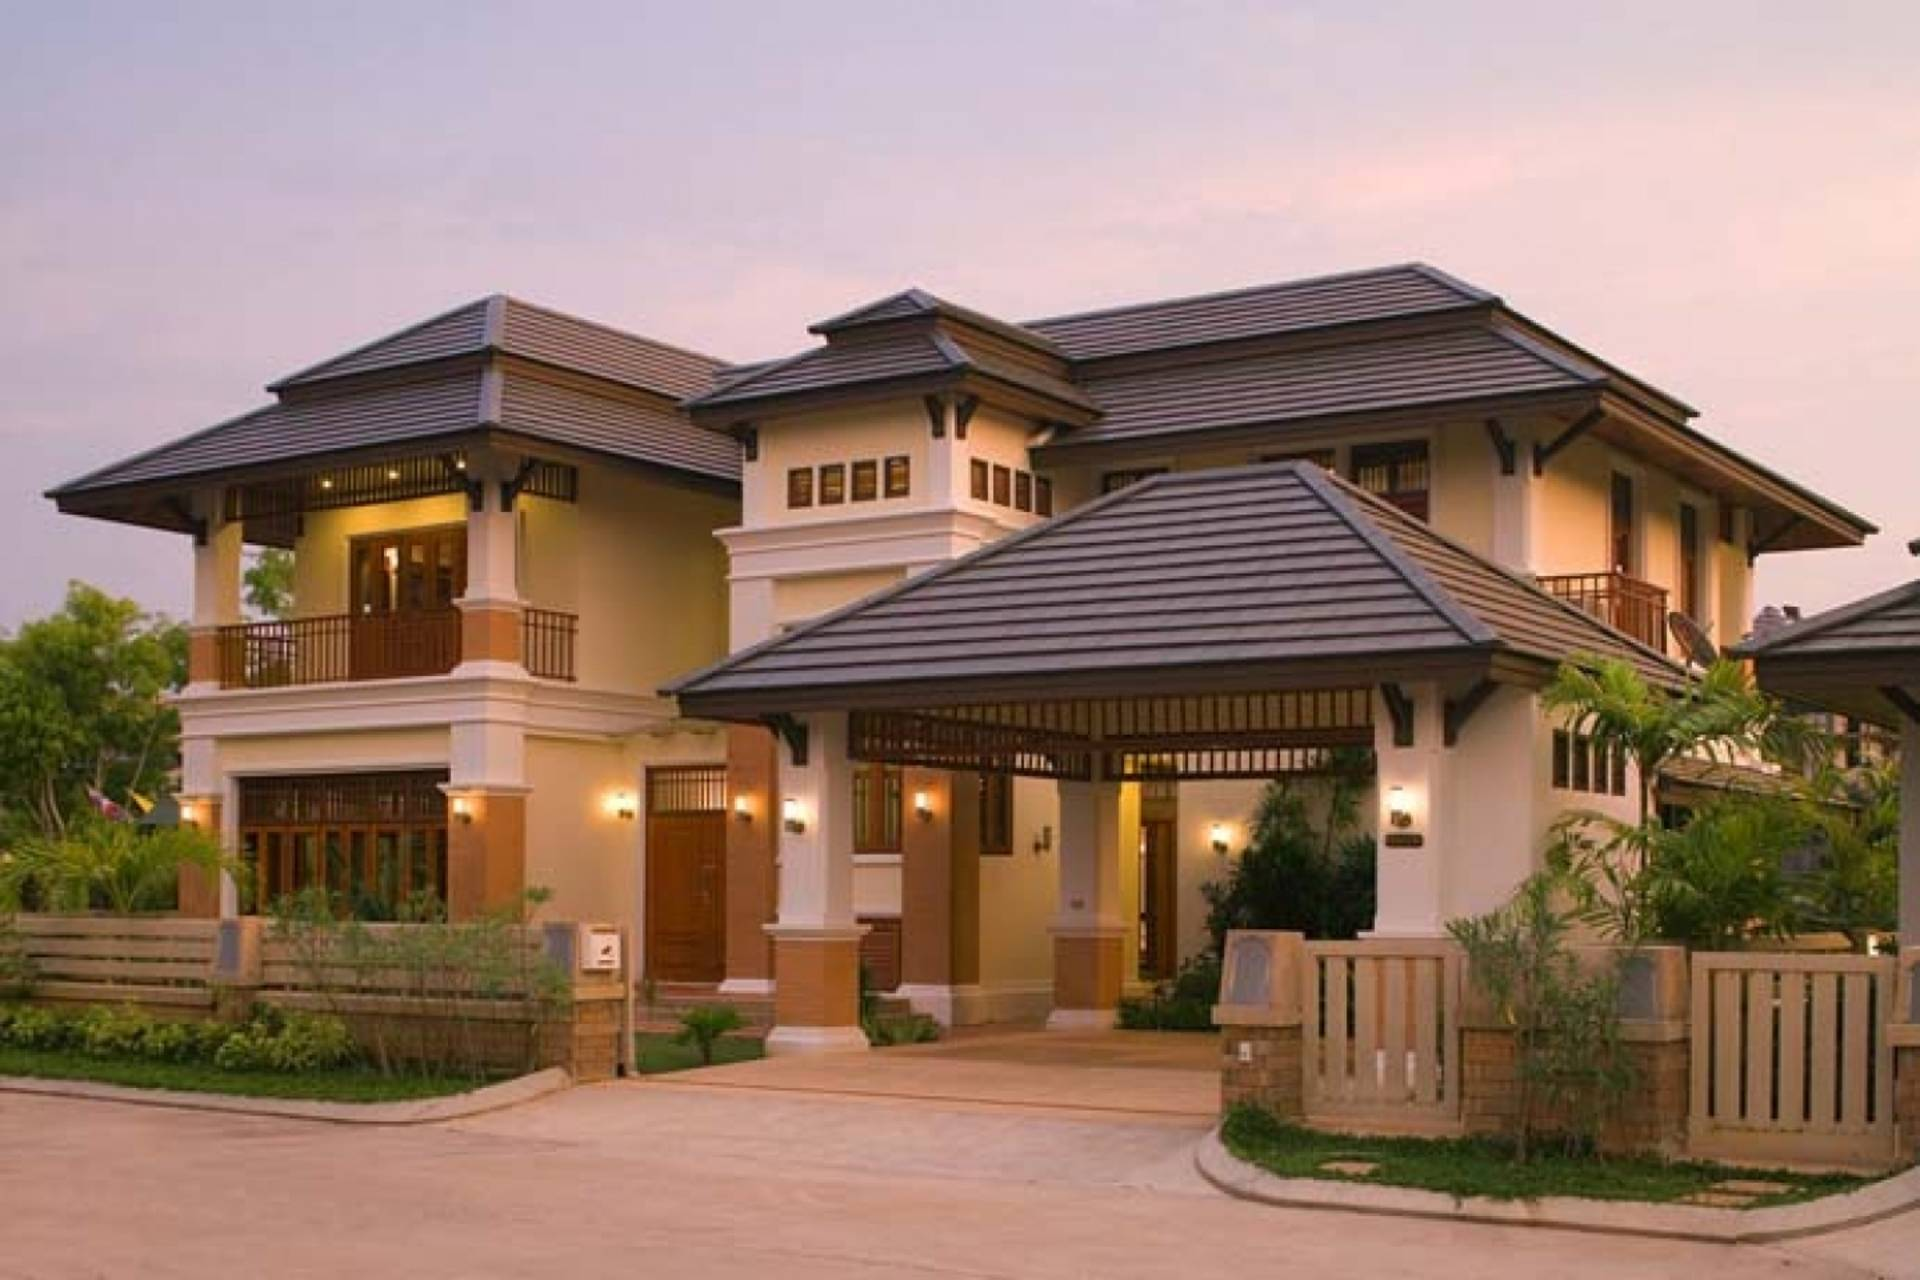 Best Interesting House Designs House Plans 109457,Cool Minecraft House Ideas Blueprints